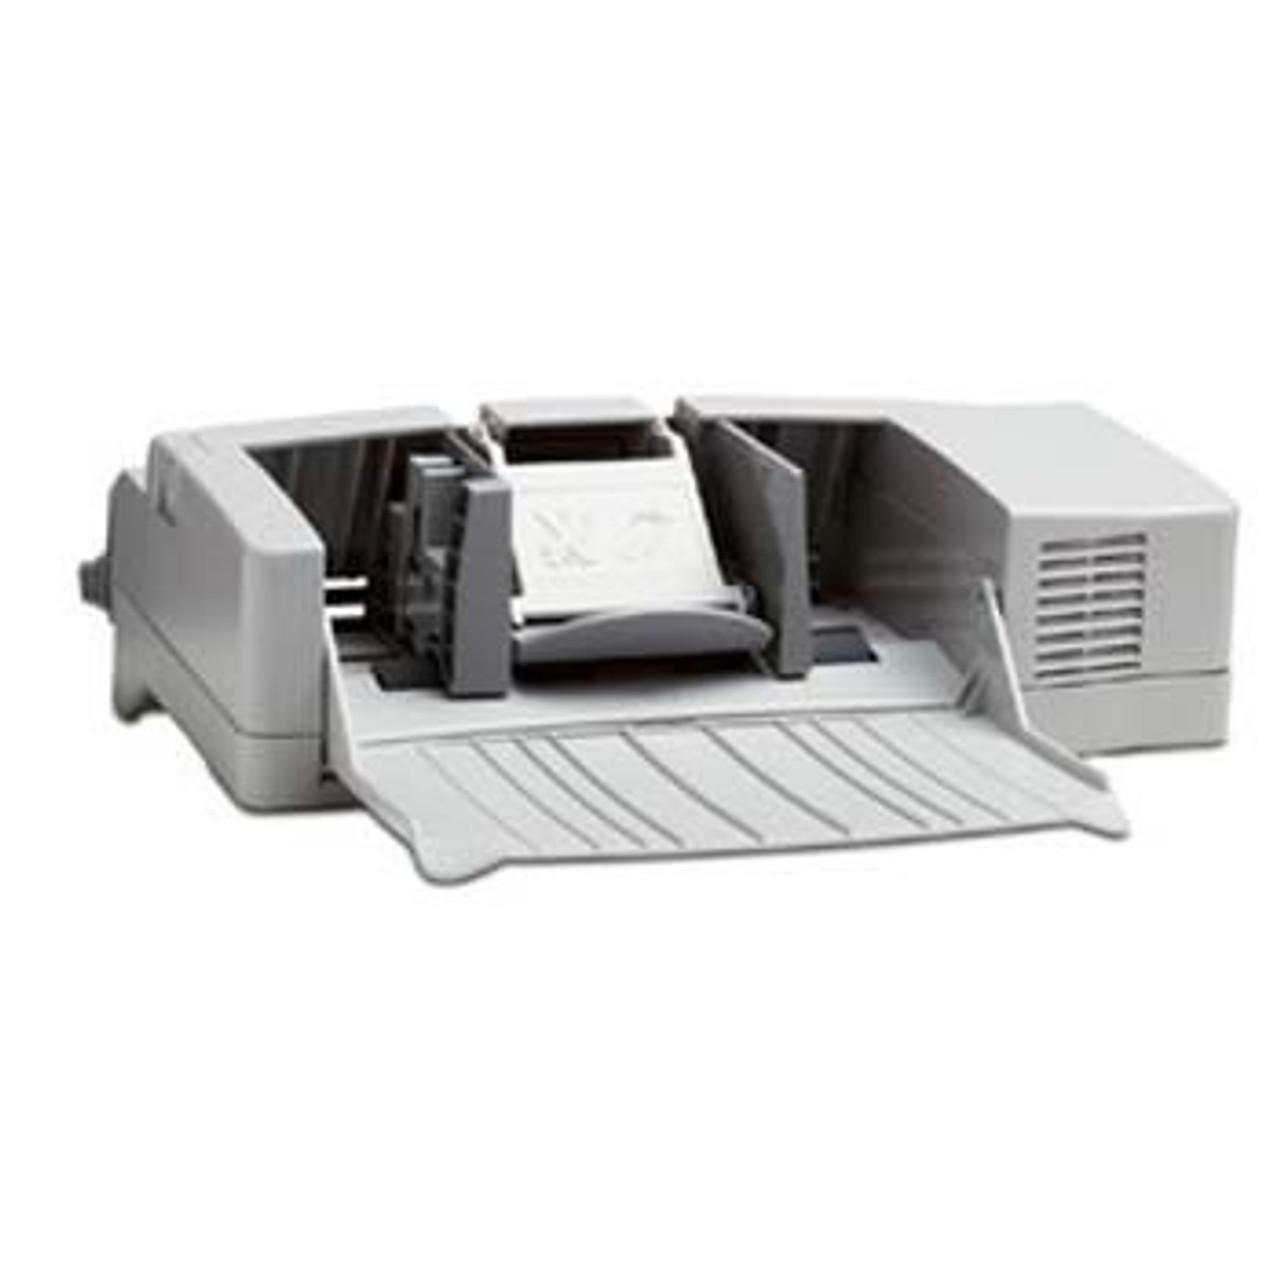 HP LaserJet Envelope Feeder HP 4250/4350/4345/4350